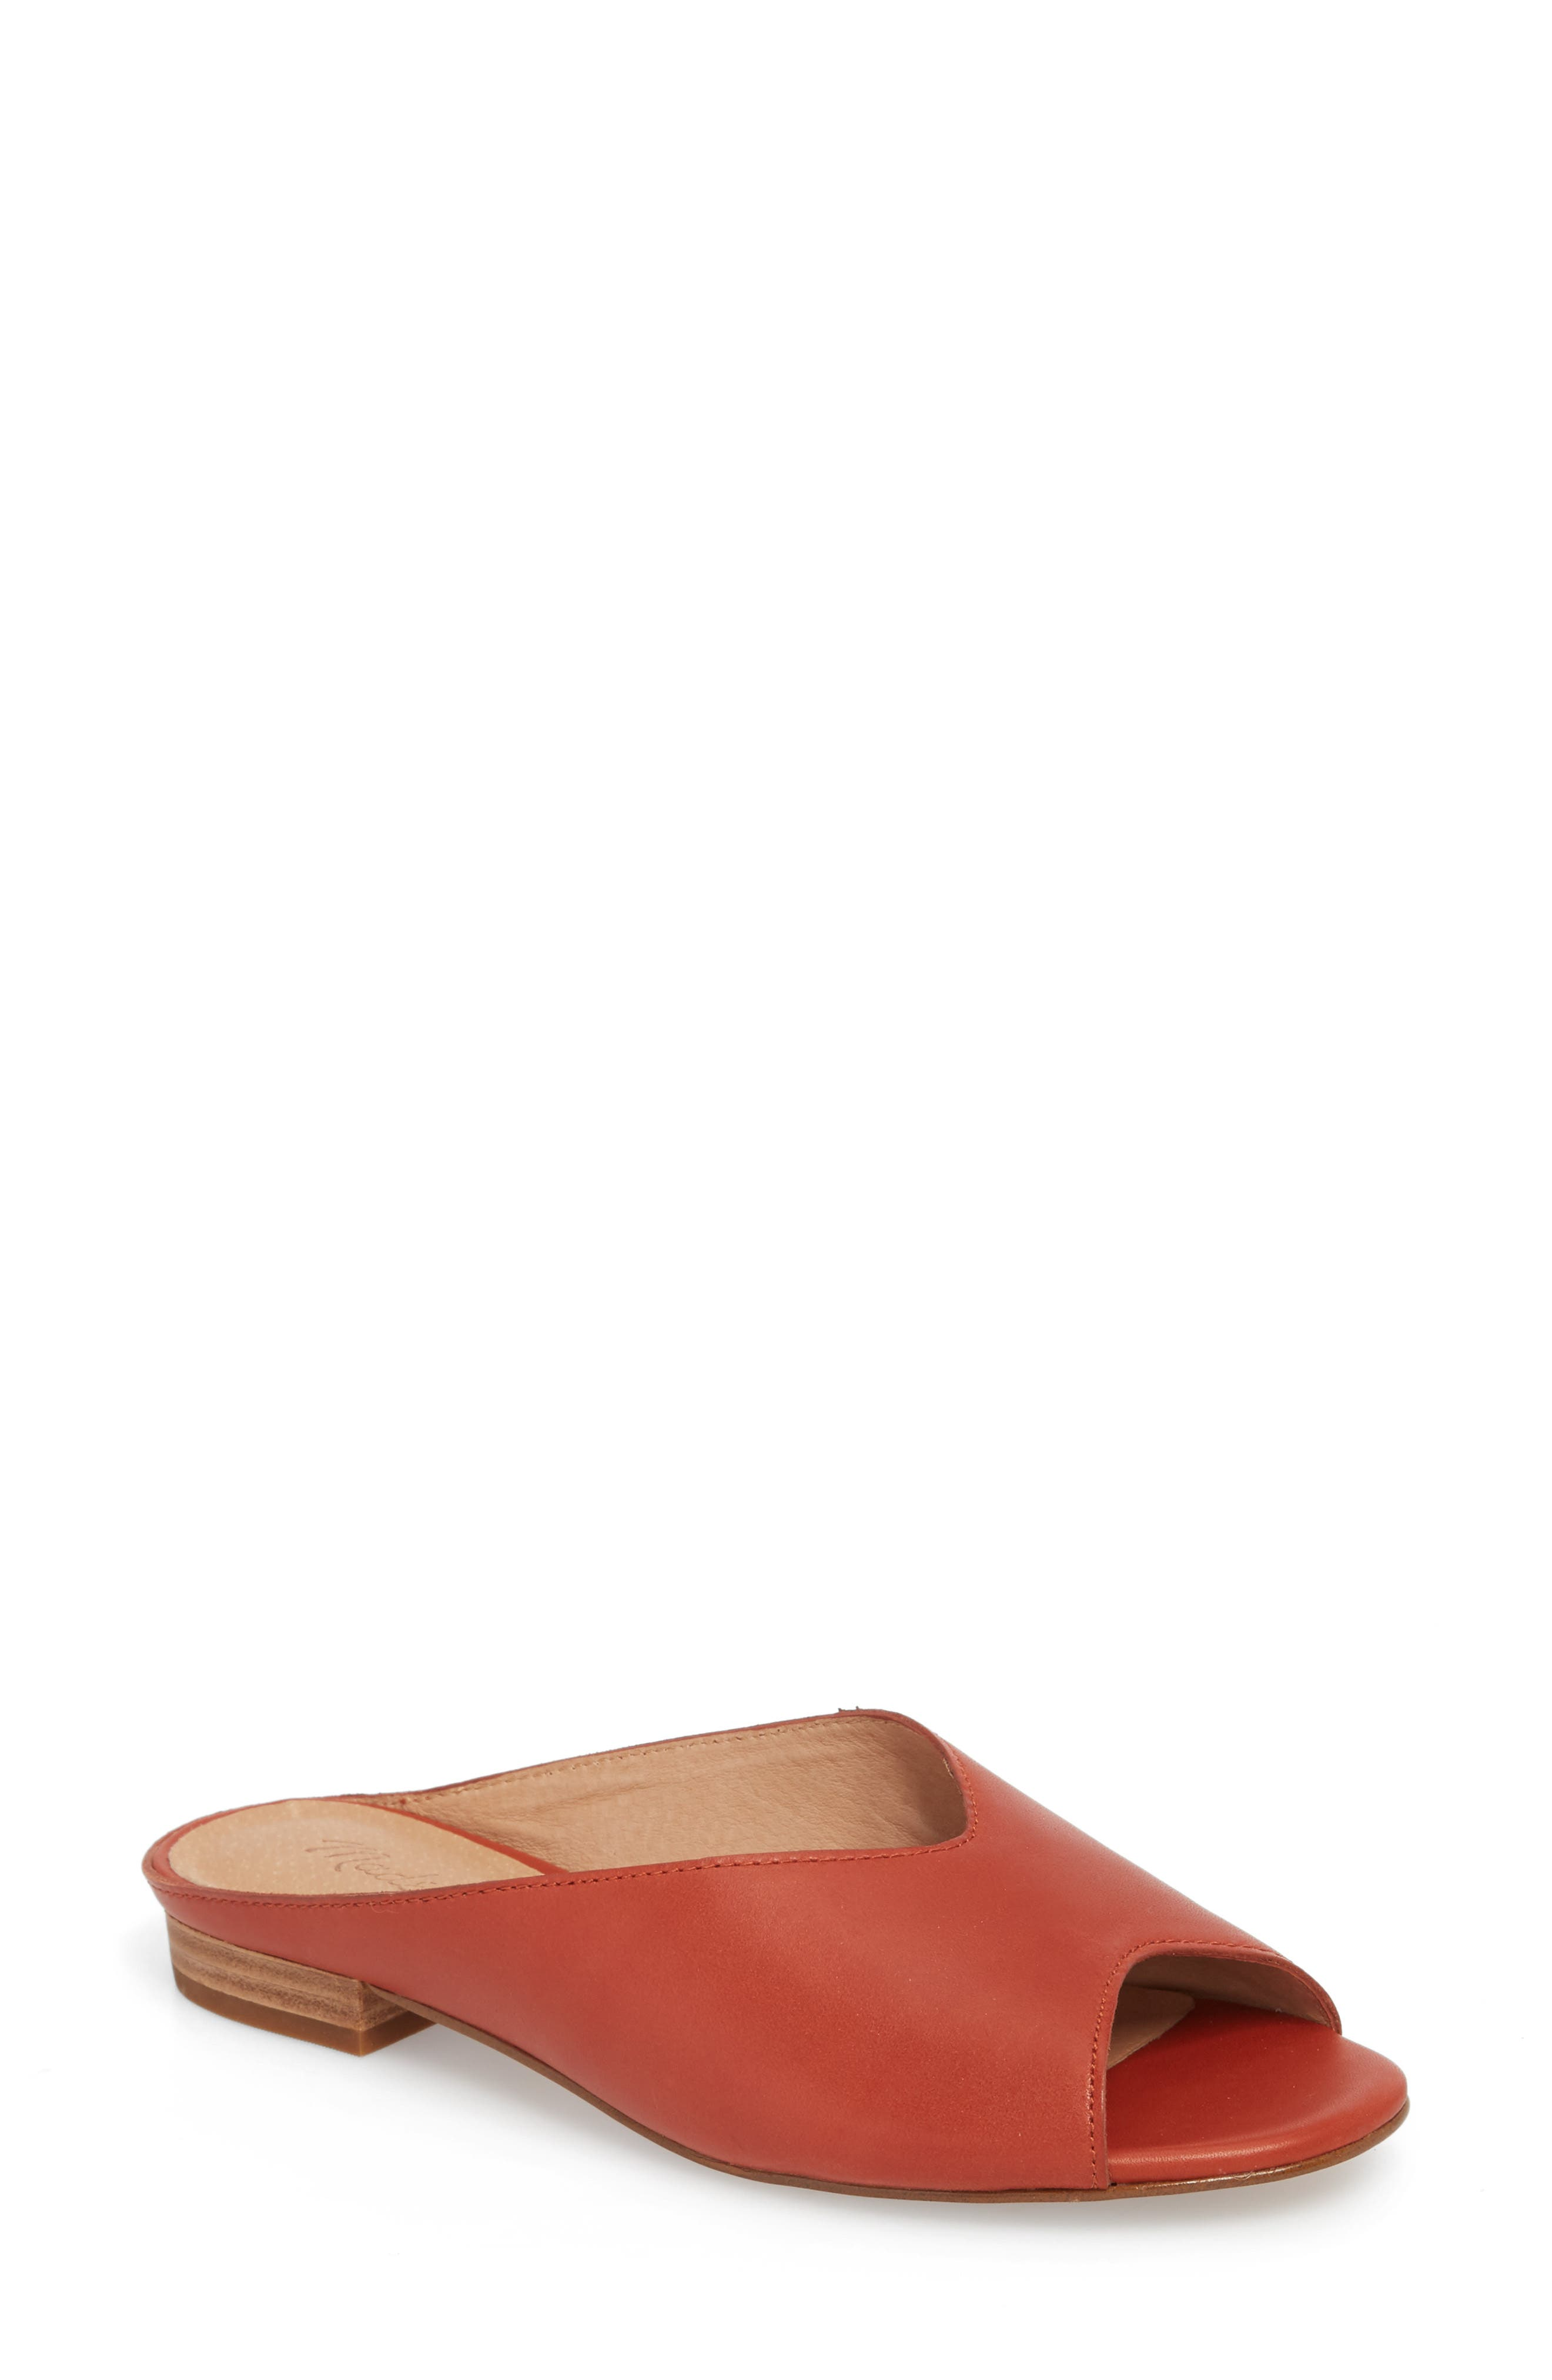 Tavi Slide Sandal,                         Main,                         color, Dark Cinnabar Leather